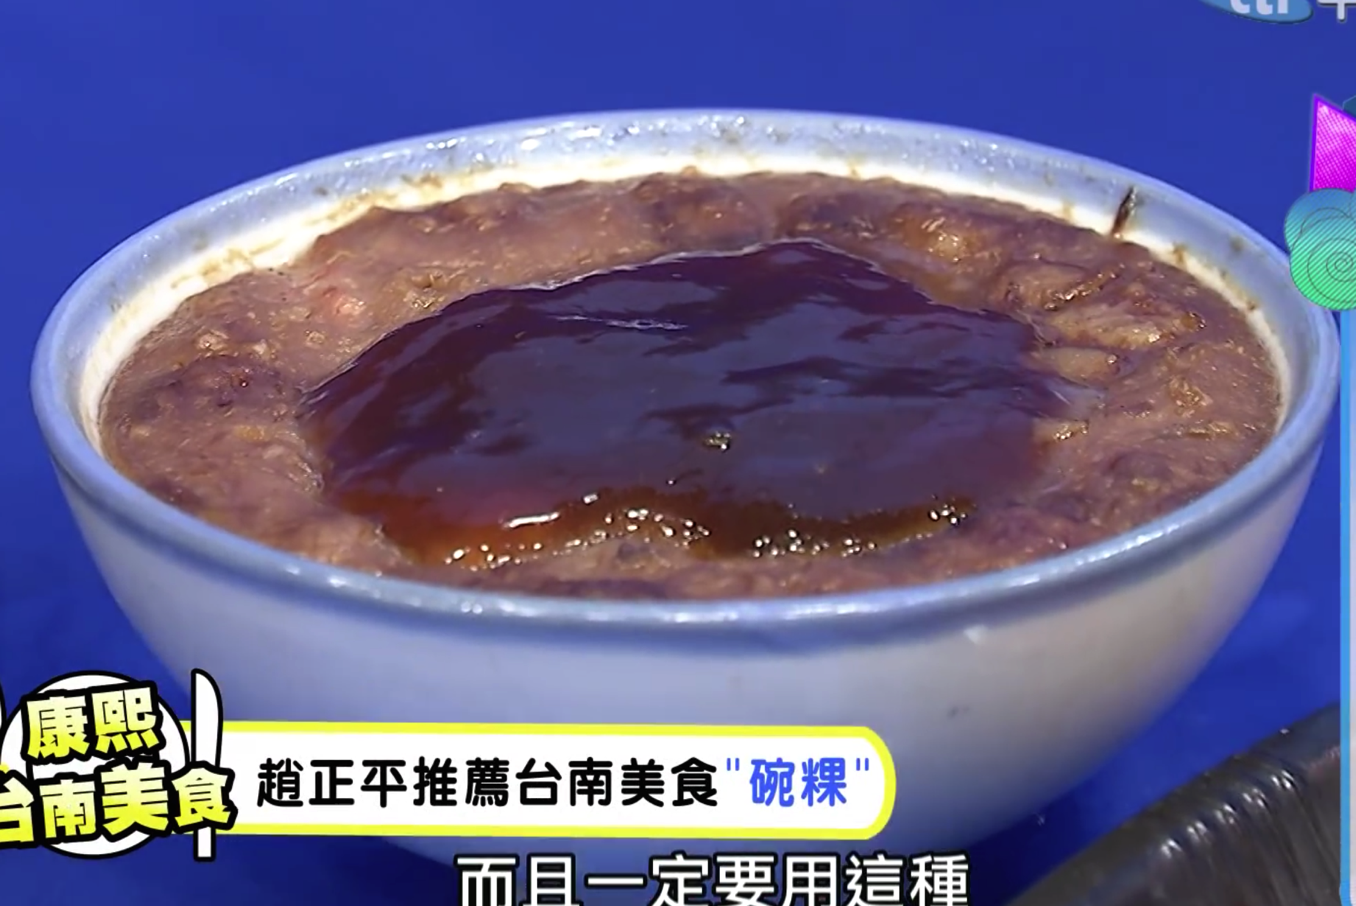 taiwanmeibutsu1